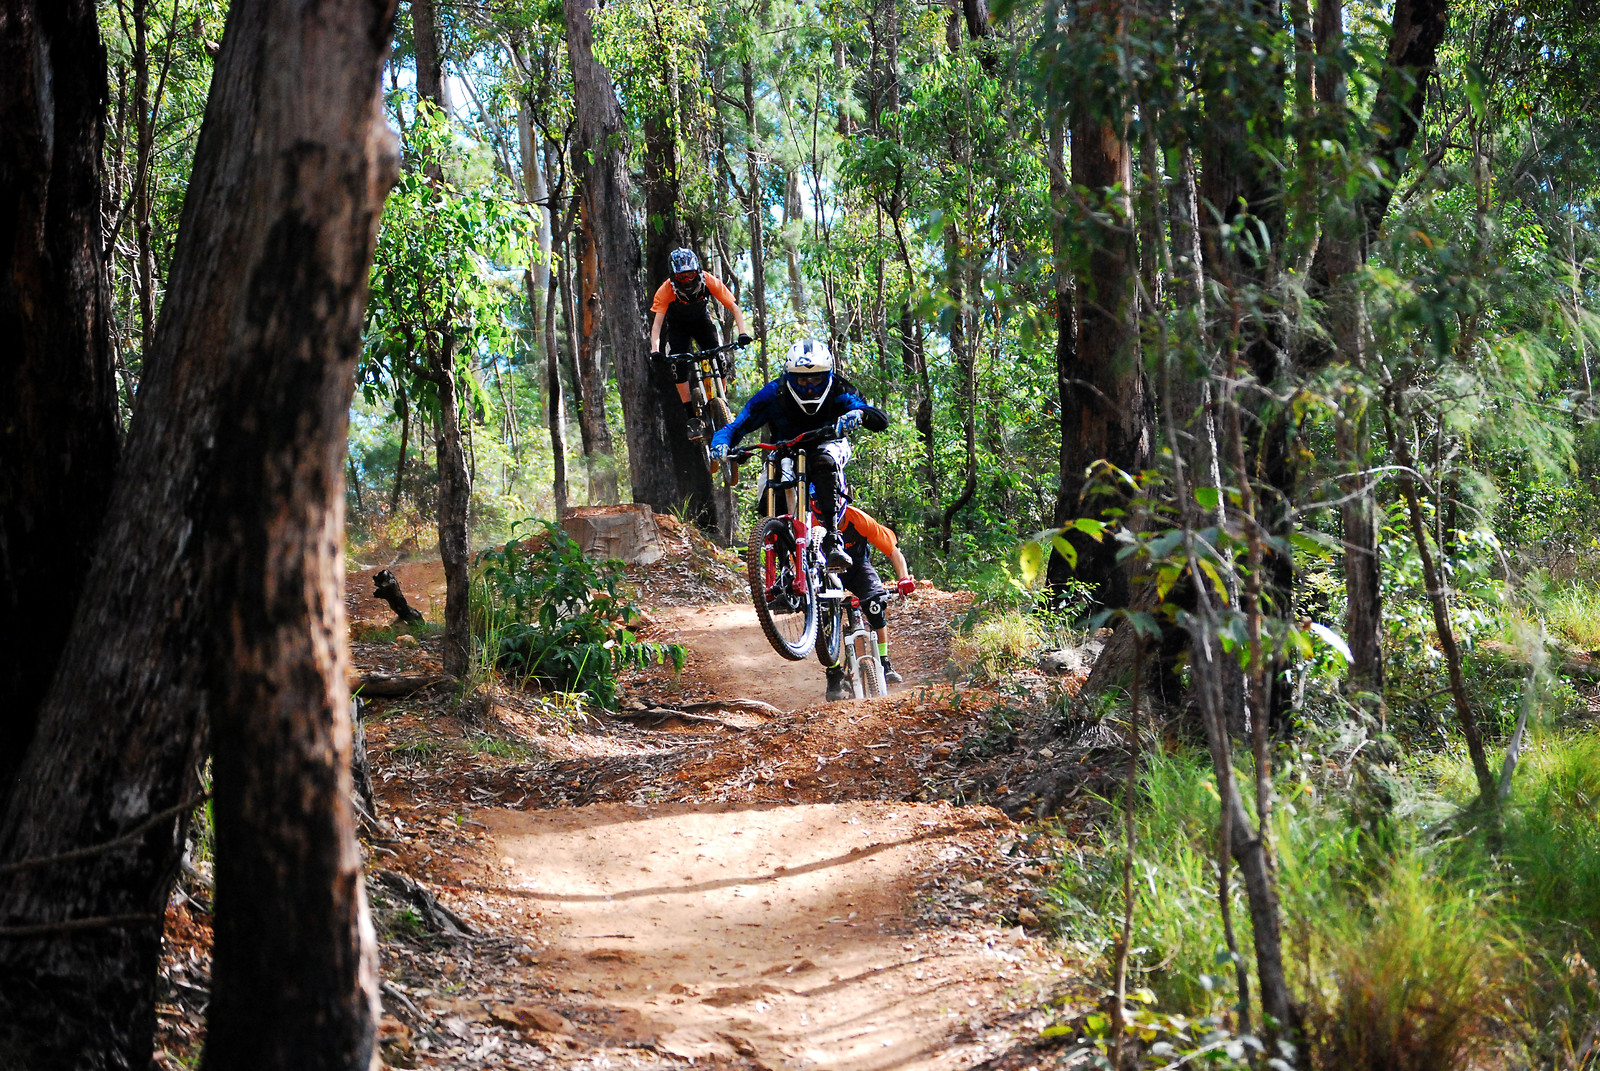 DSC 0009 - blackdiamondmtb - Mountain Biking Pictures - Vital MTB